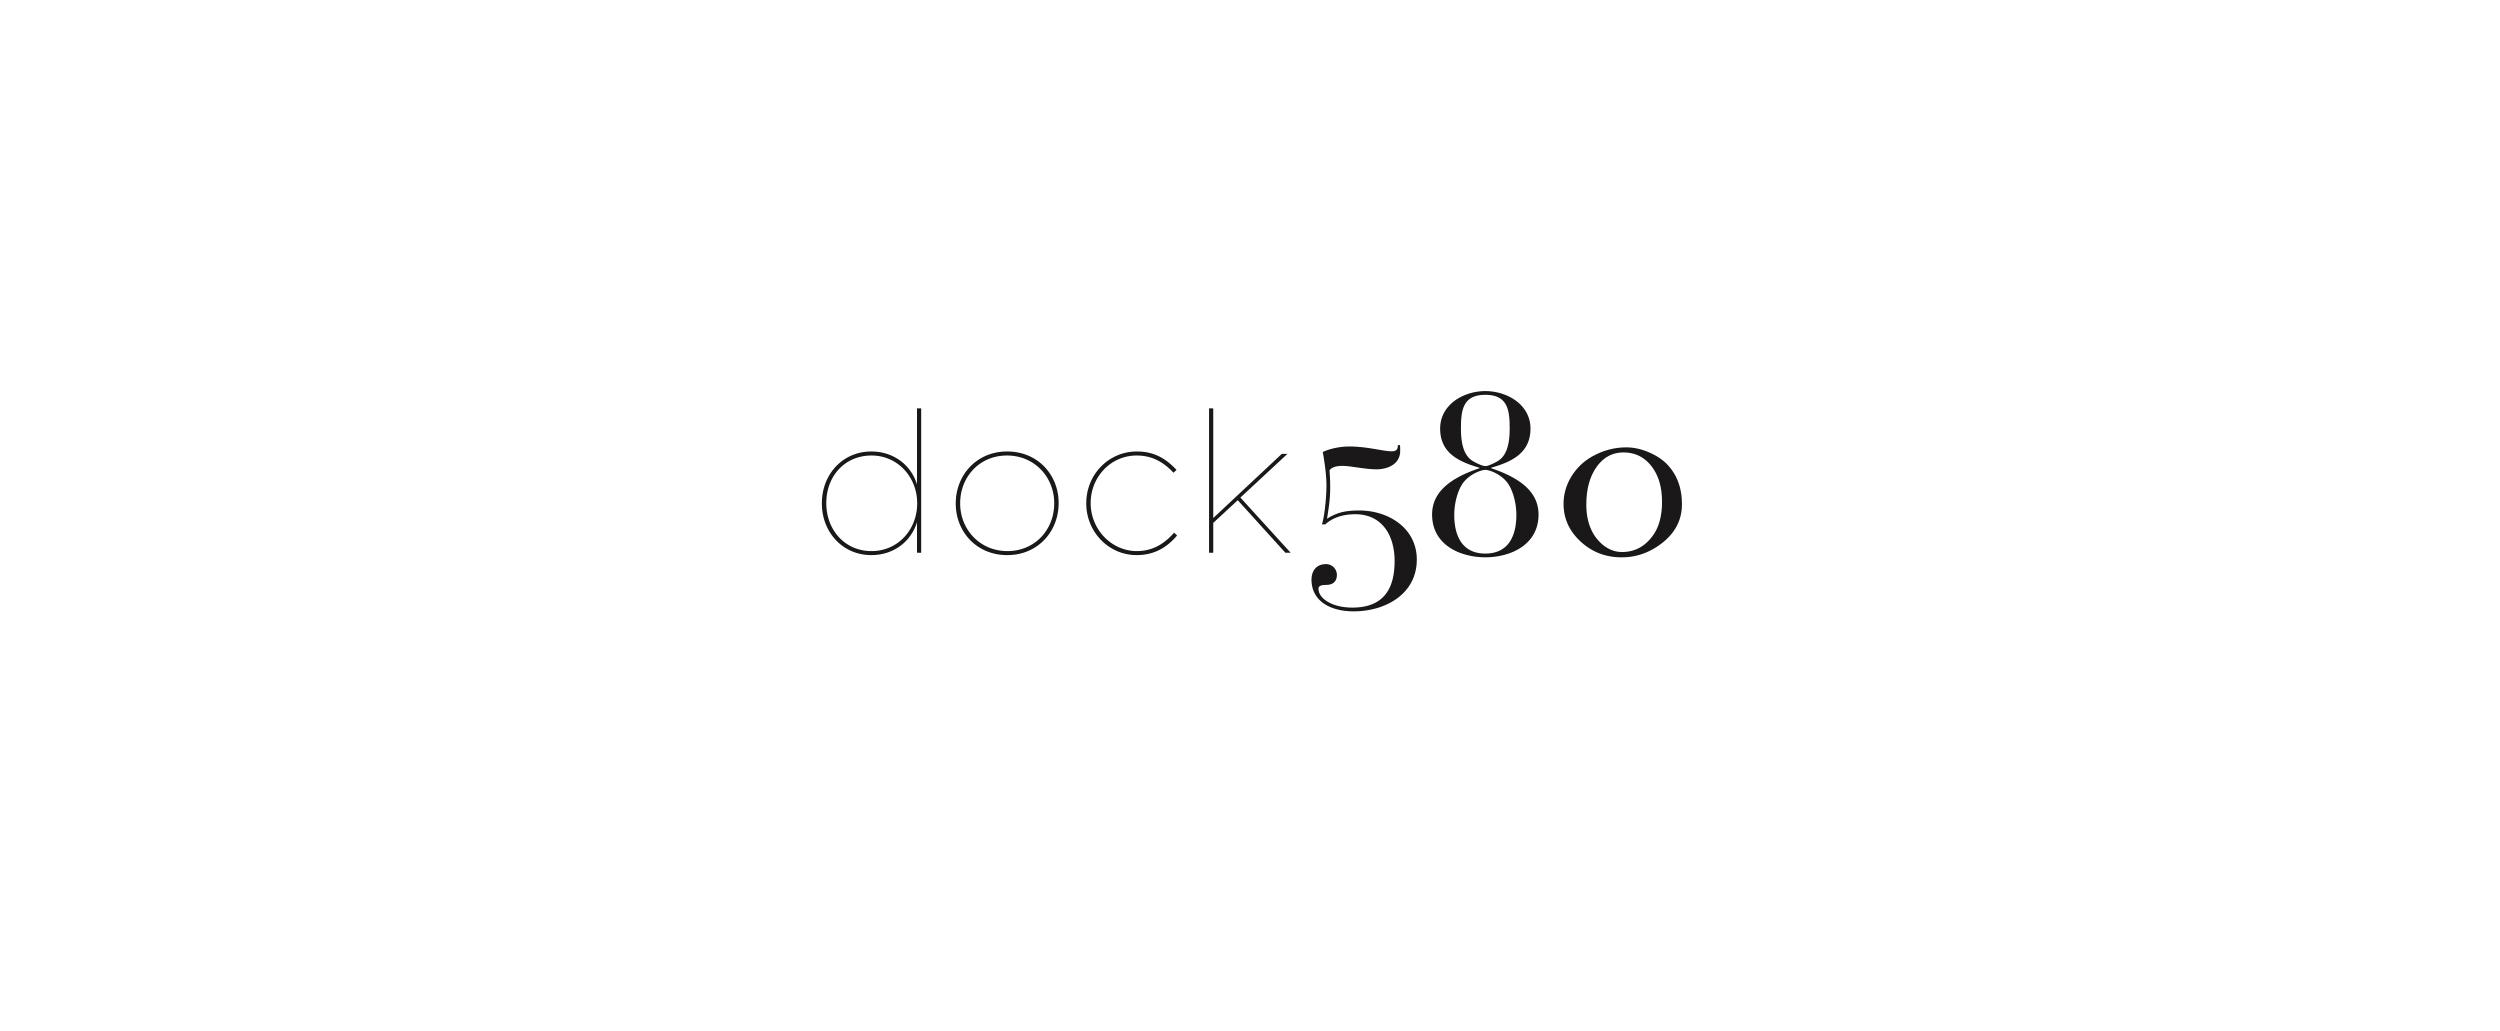 Dock580.jpg